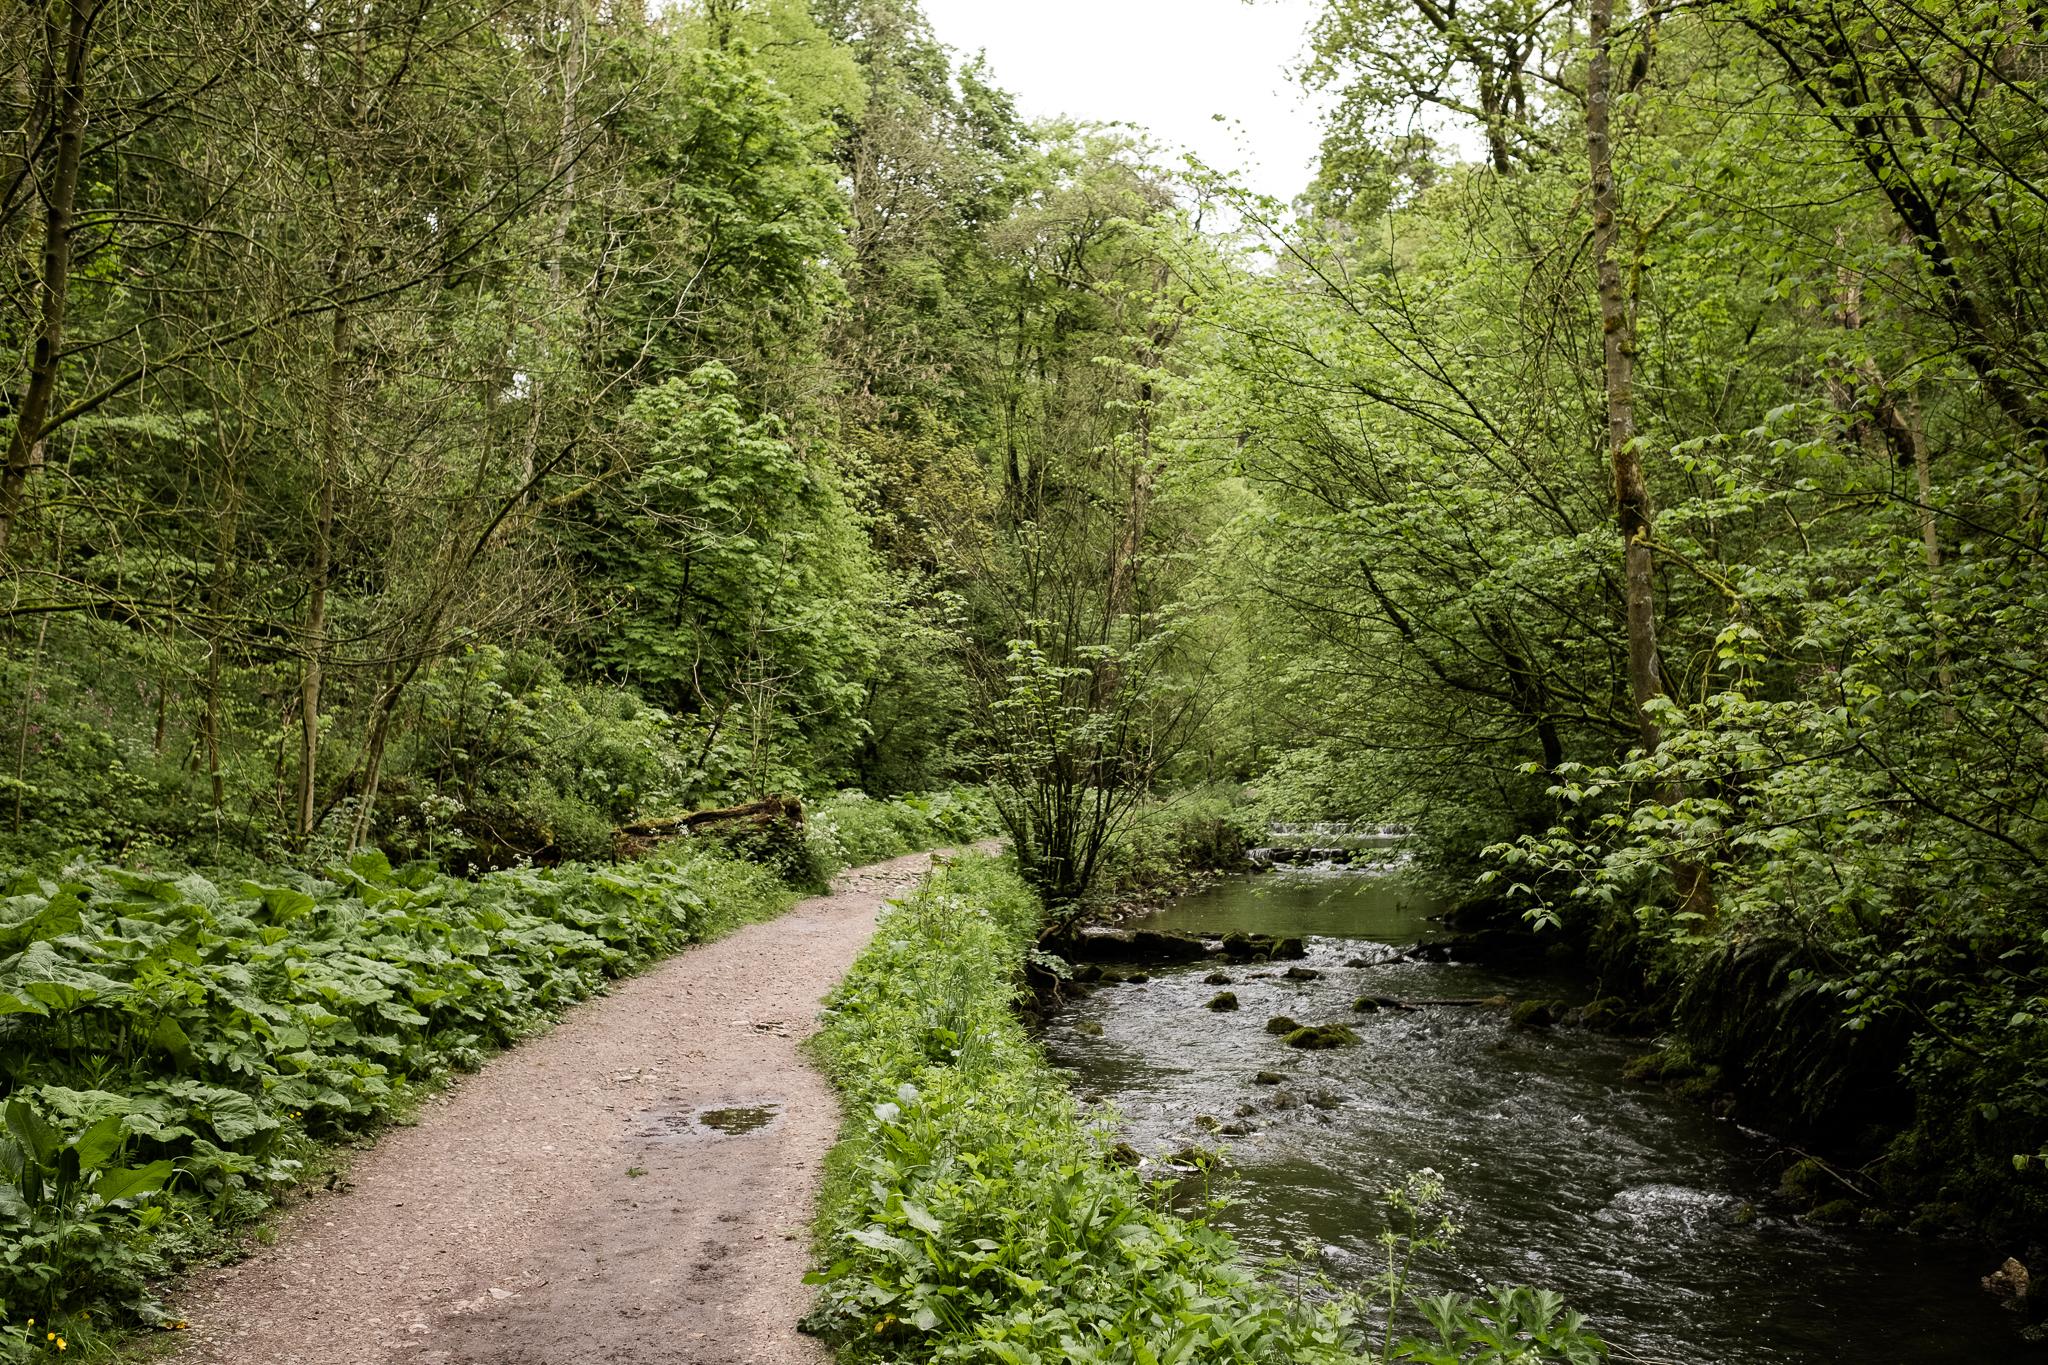 05.19.2017 The Photowalk Network Get Some Fresh Air Photowalk at Hartington and Biggin, Staffordshire Peak District National Trust-12.jpg